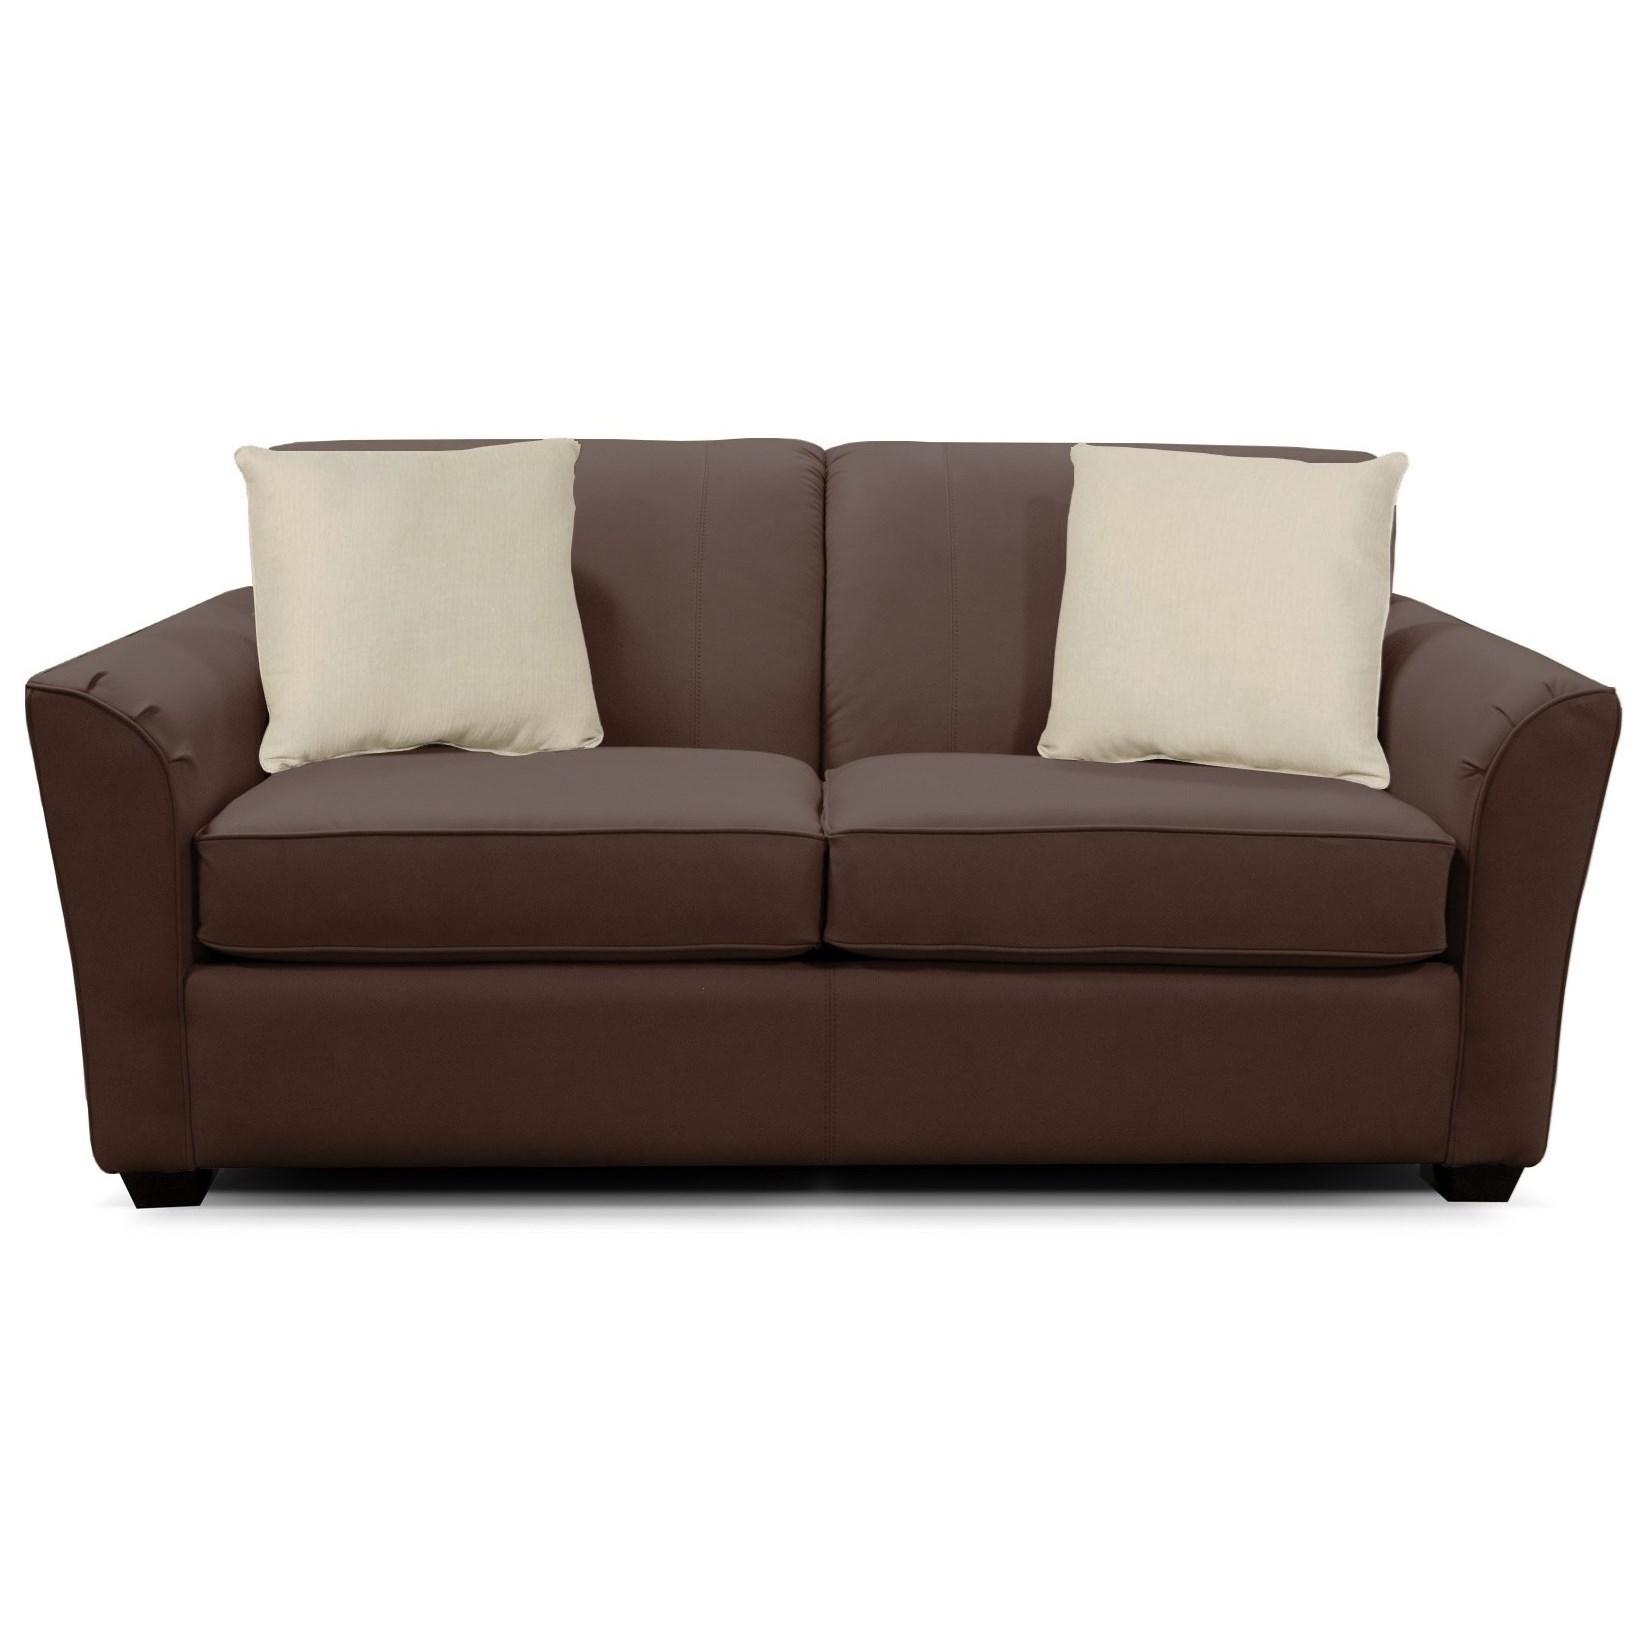 England Smyrna Full Size Sofa Sleeper - Item Number: 308L-5912